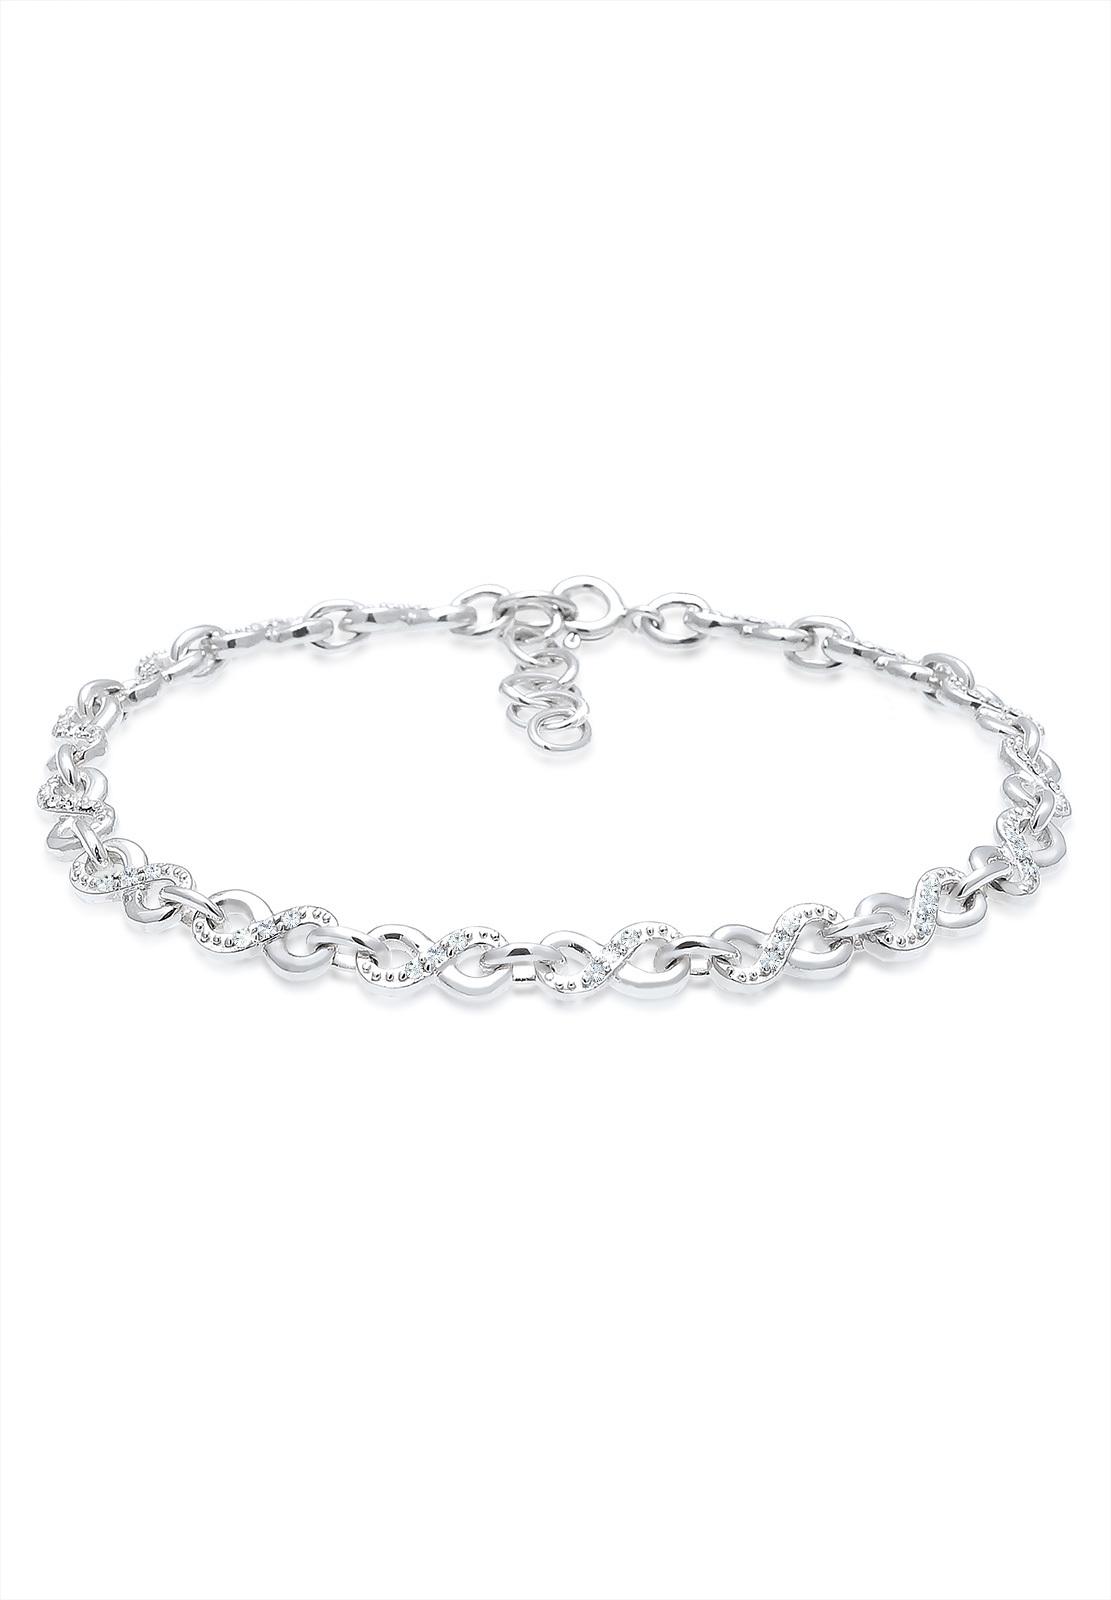 Glieder-Armband Infinity | Kristall ( Weiß ) | 925er Sterling Silber